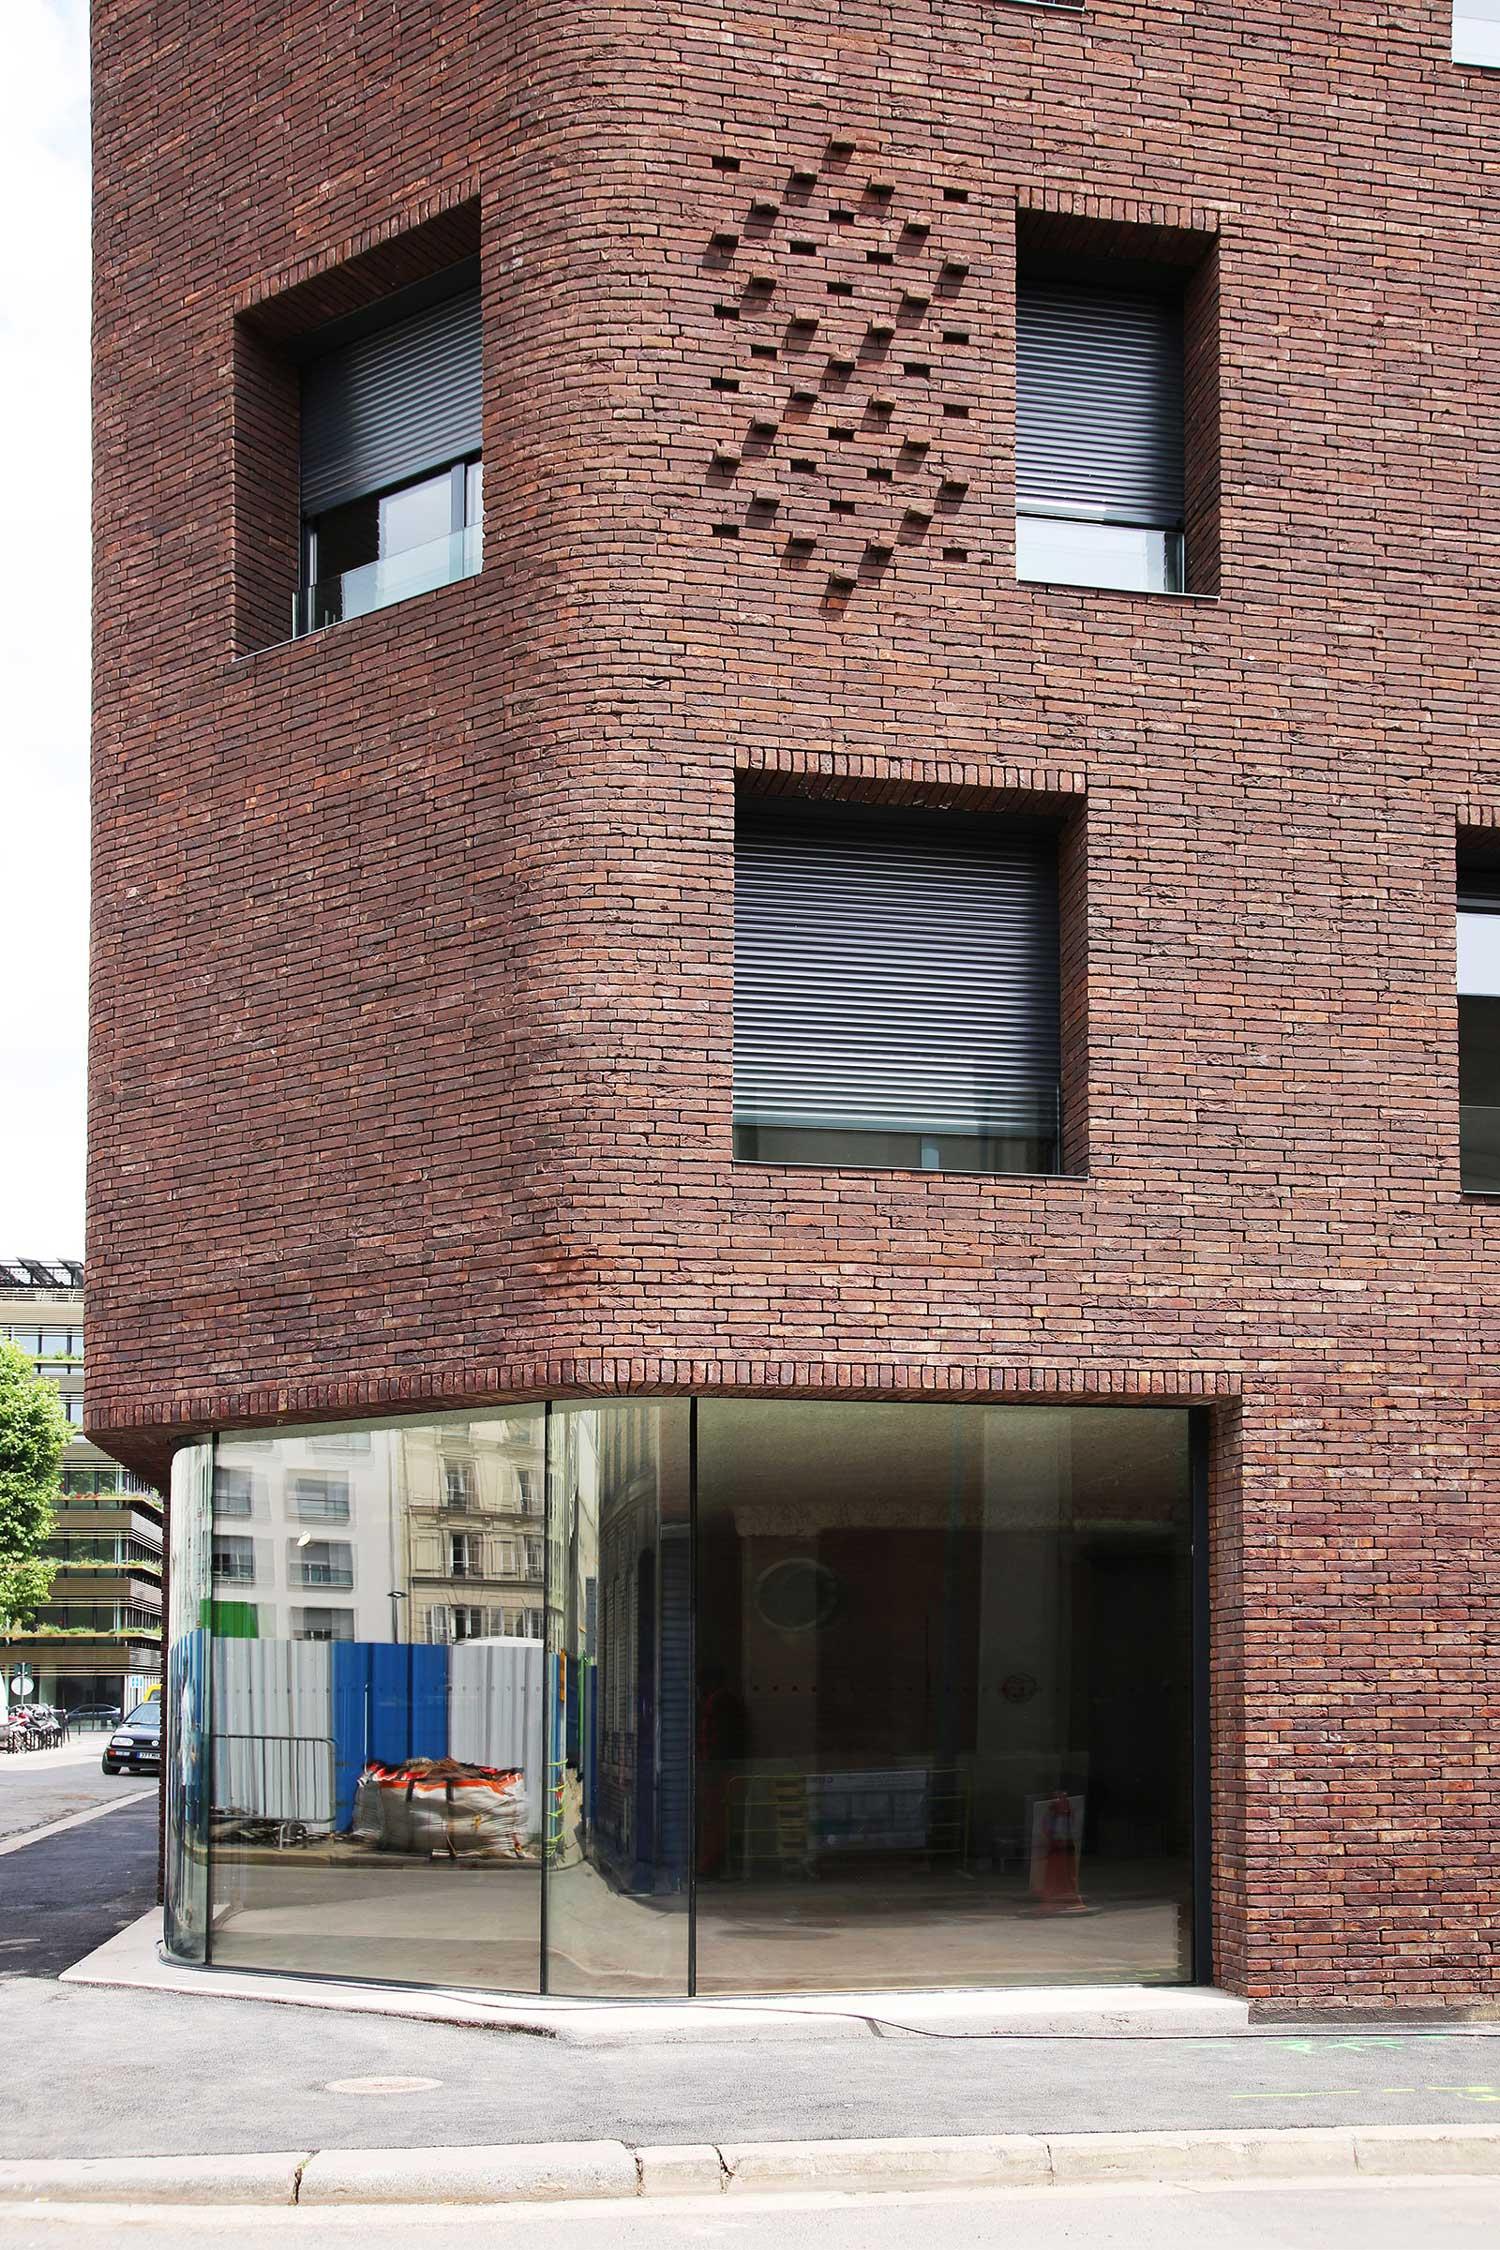 38 Social Housing By Avenier Cornejo Yellowtrace